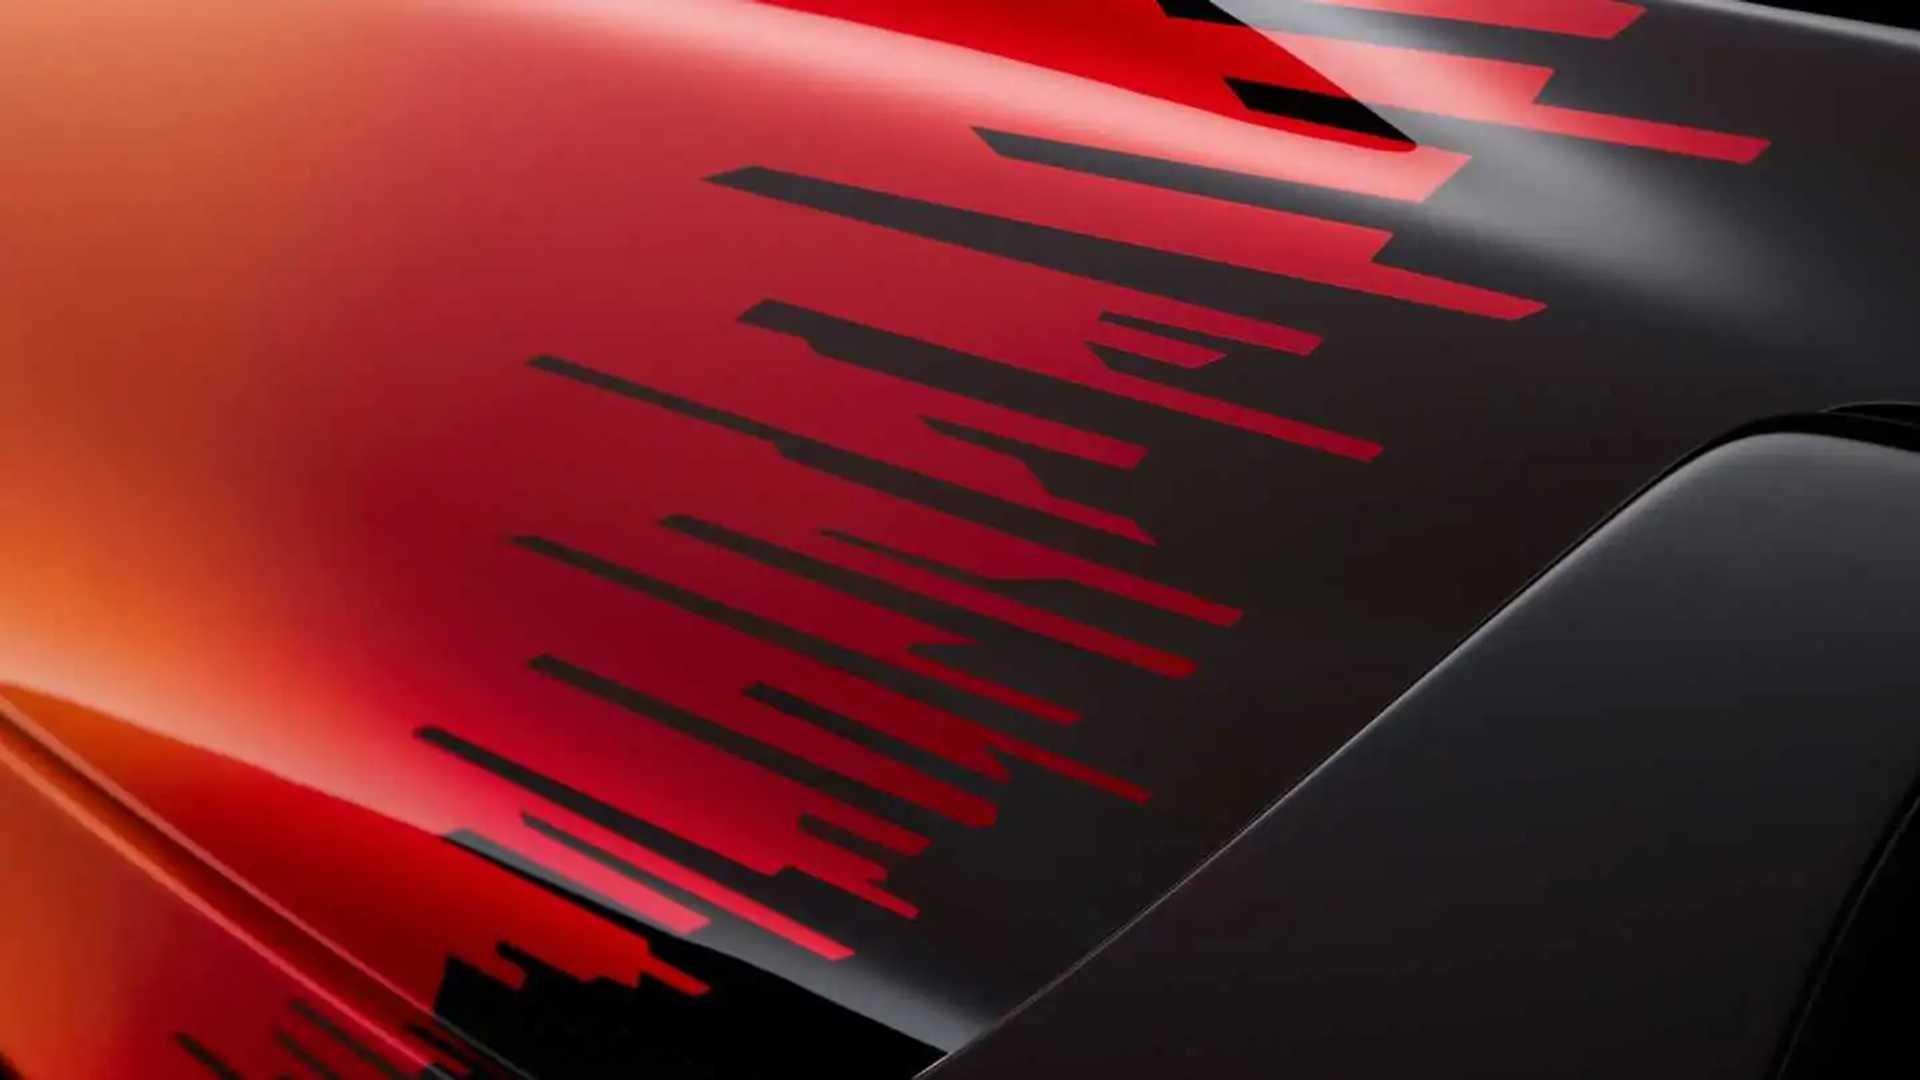 2020 McLaren 765LT Body